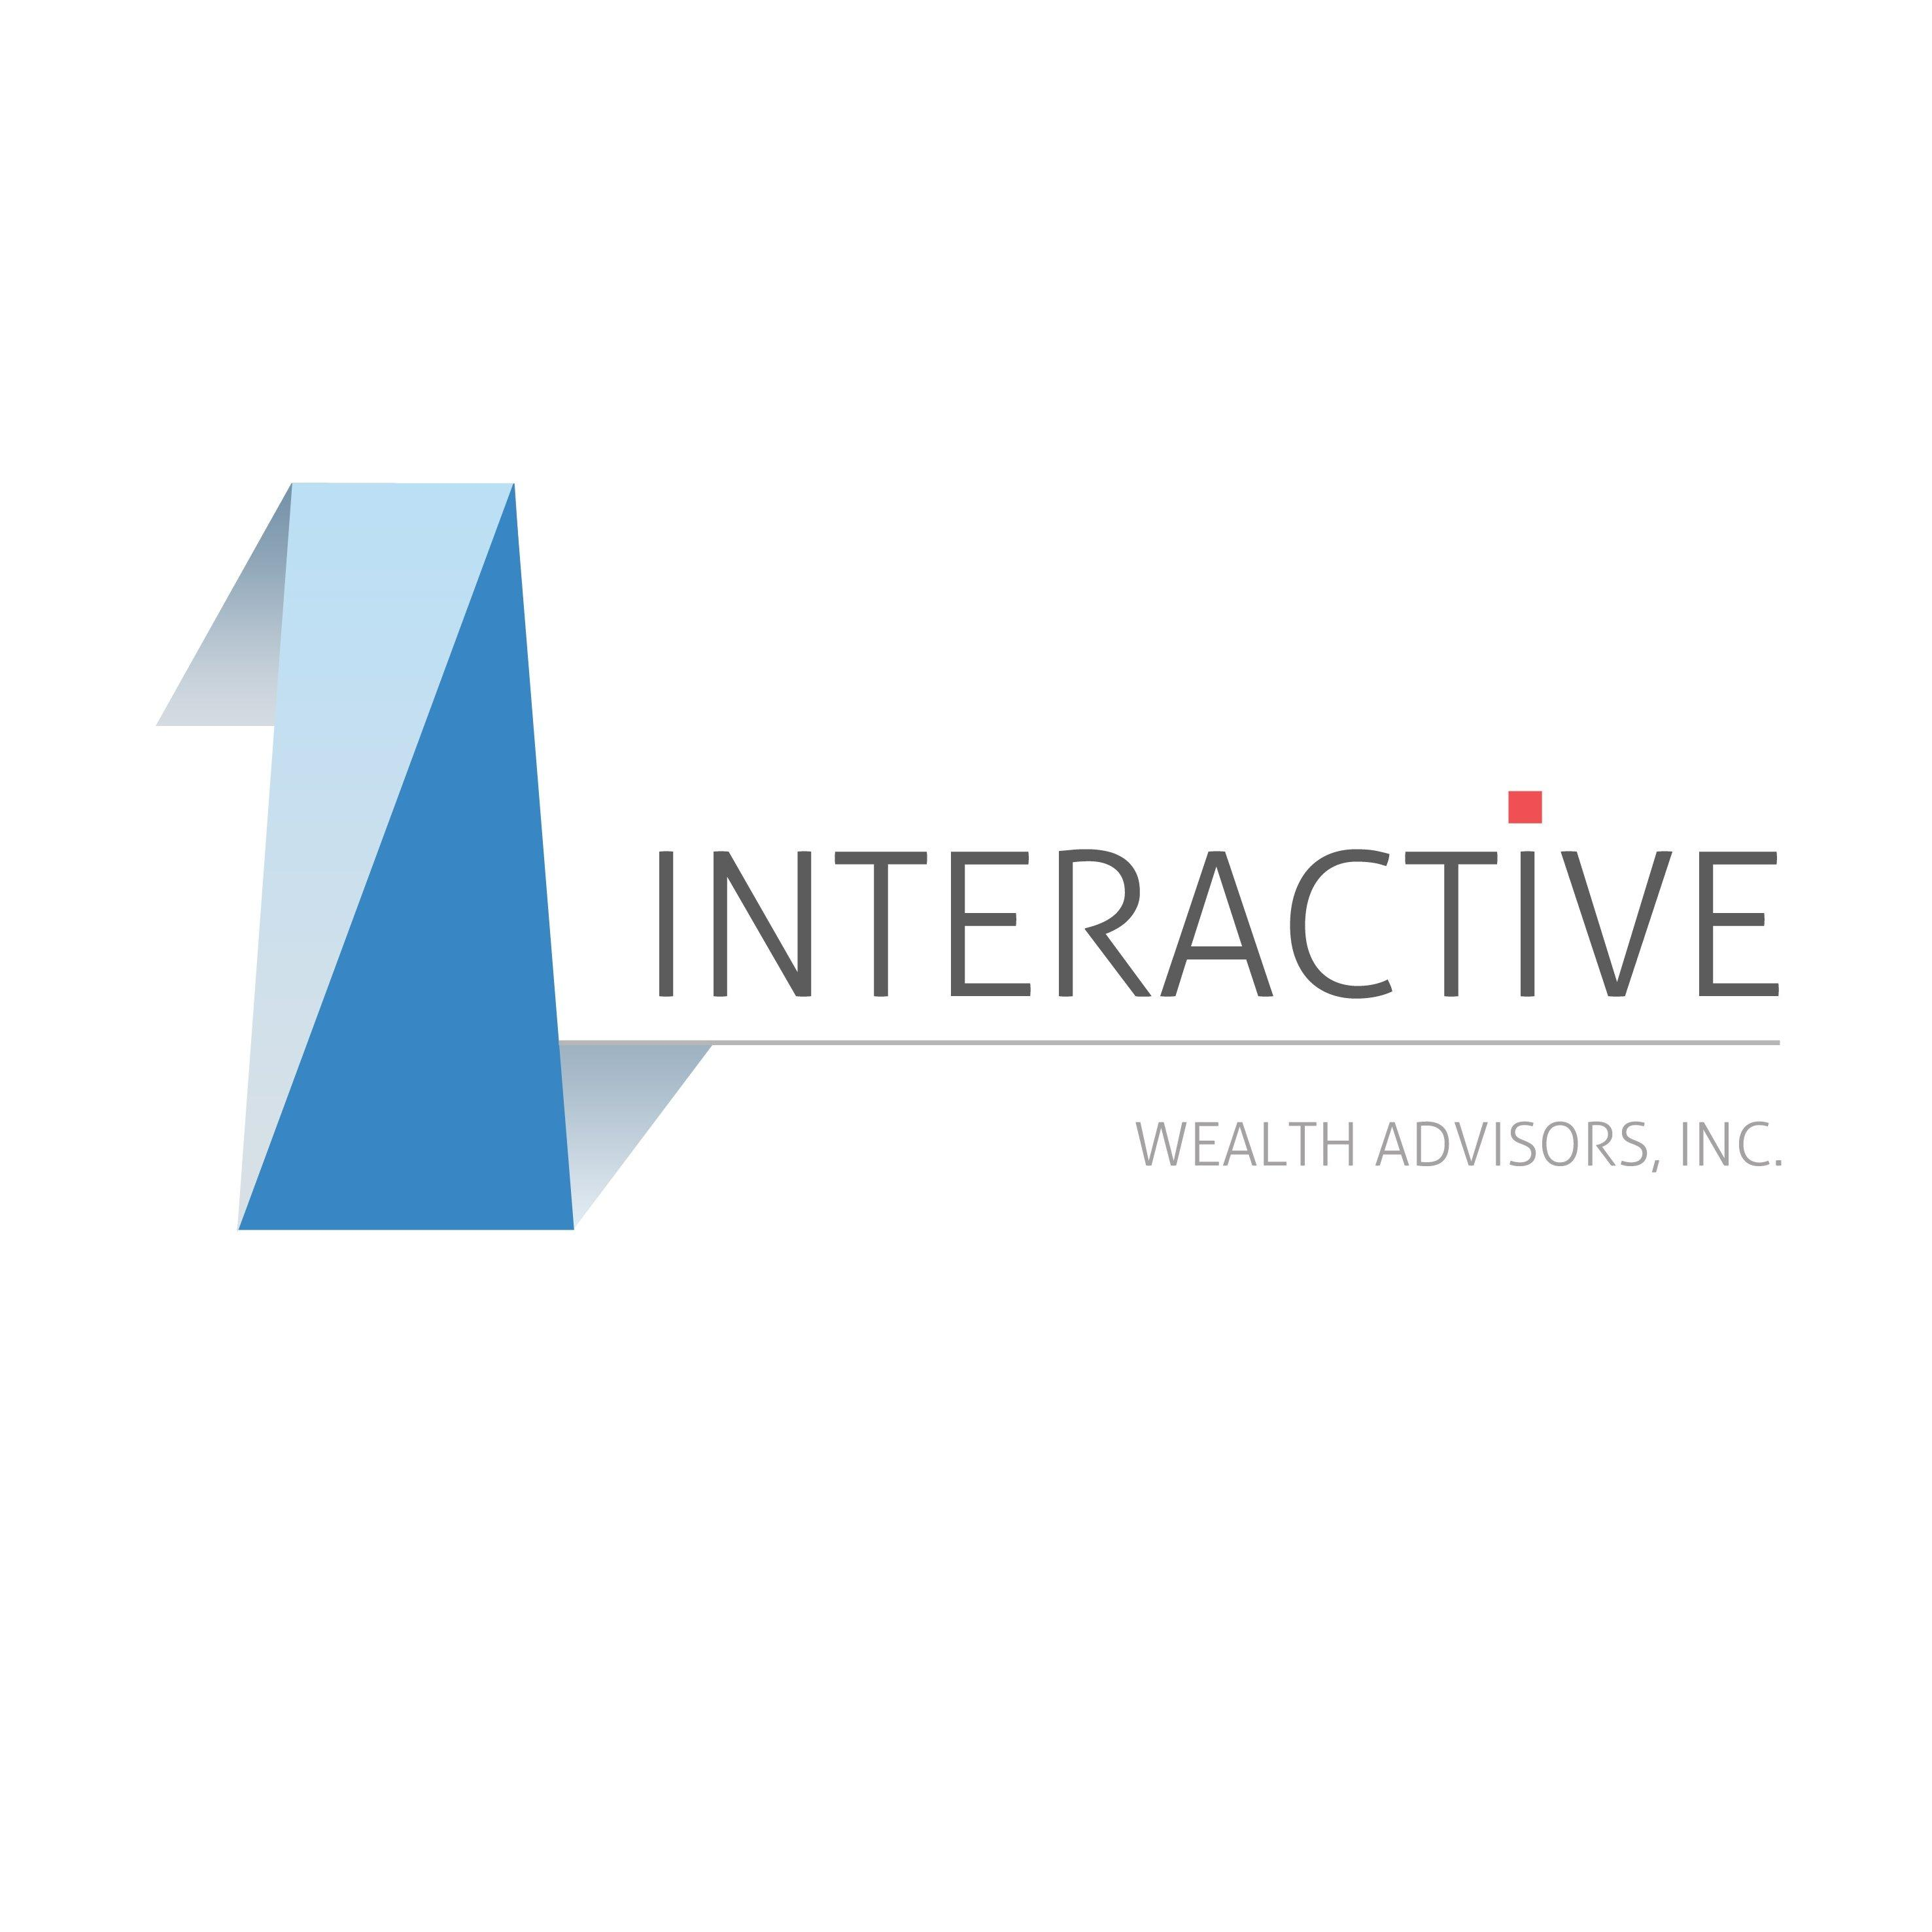 Interactive Wealth Advisors, Inc.